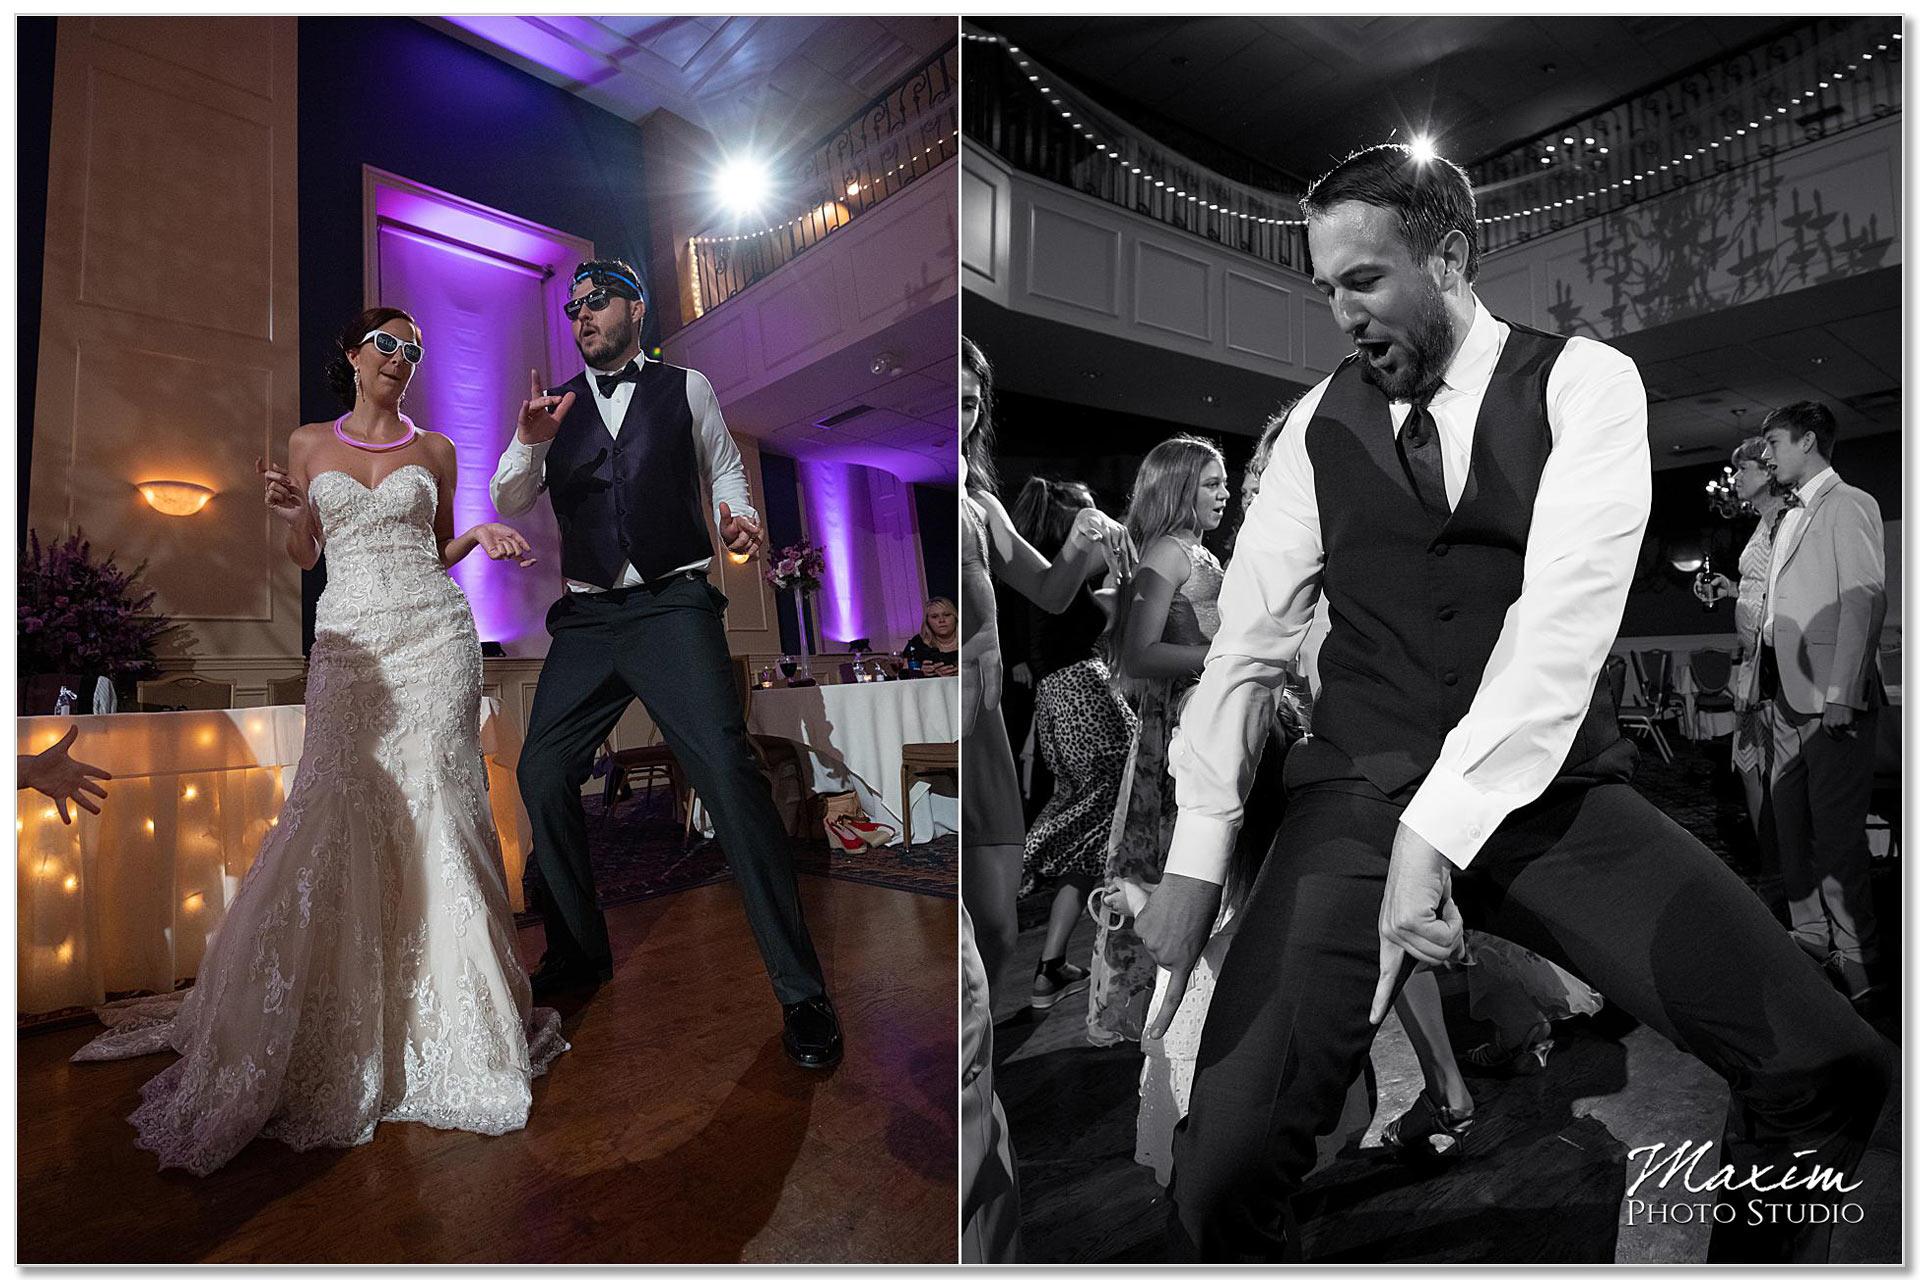 The Grand Ballroom guest dancing